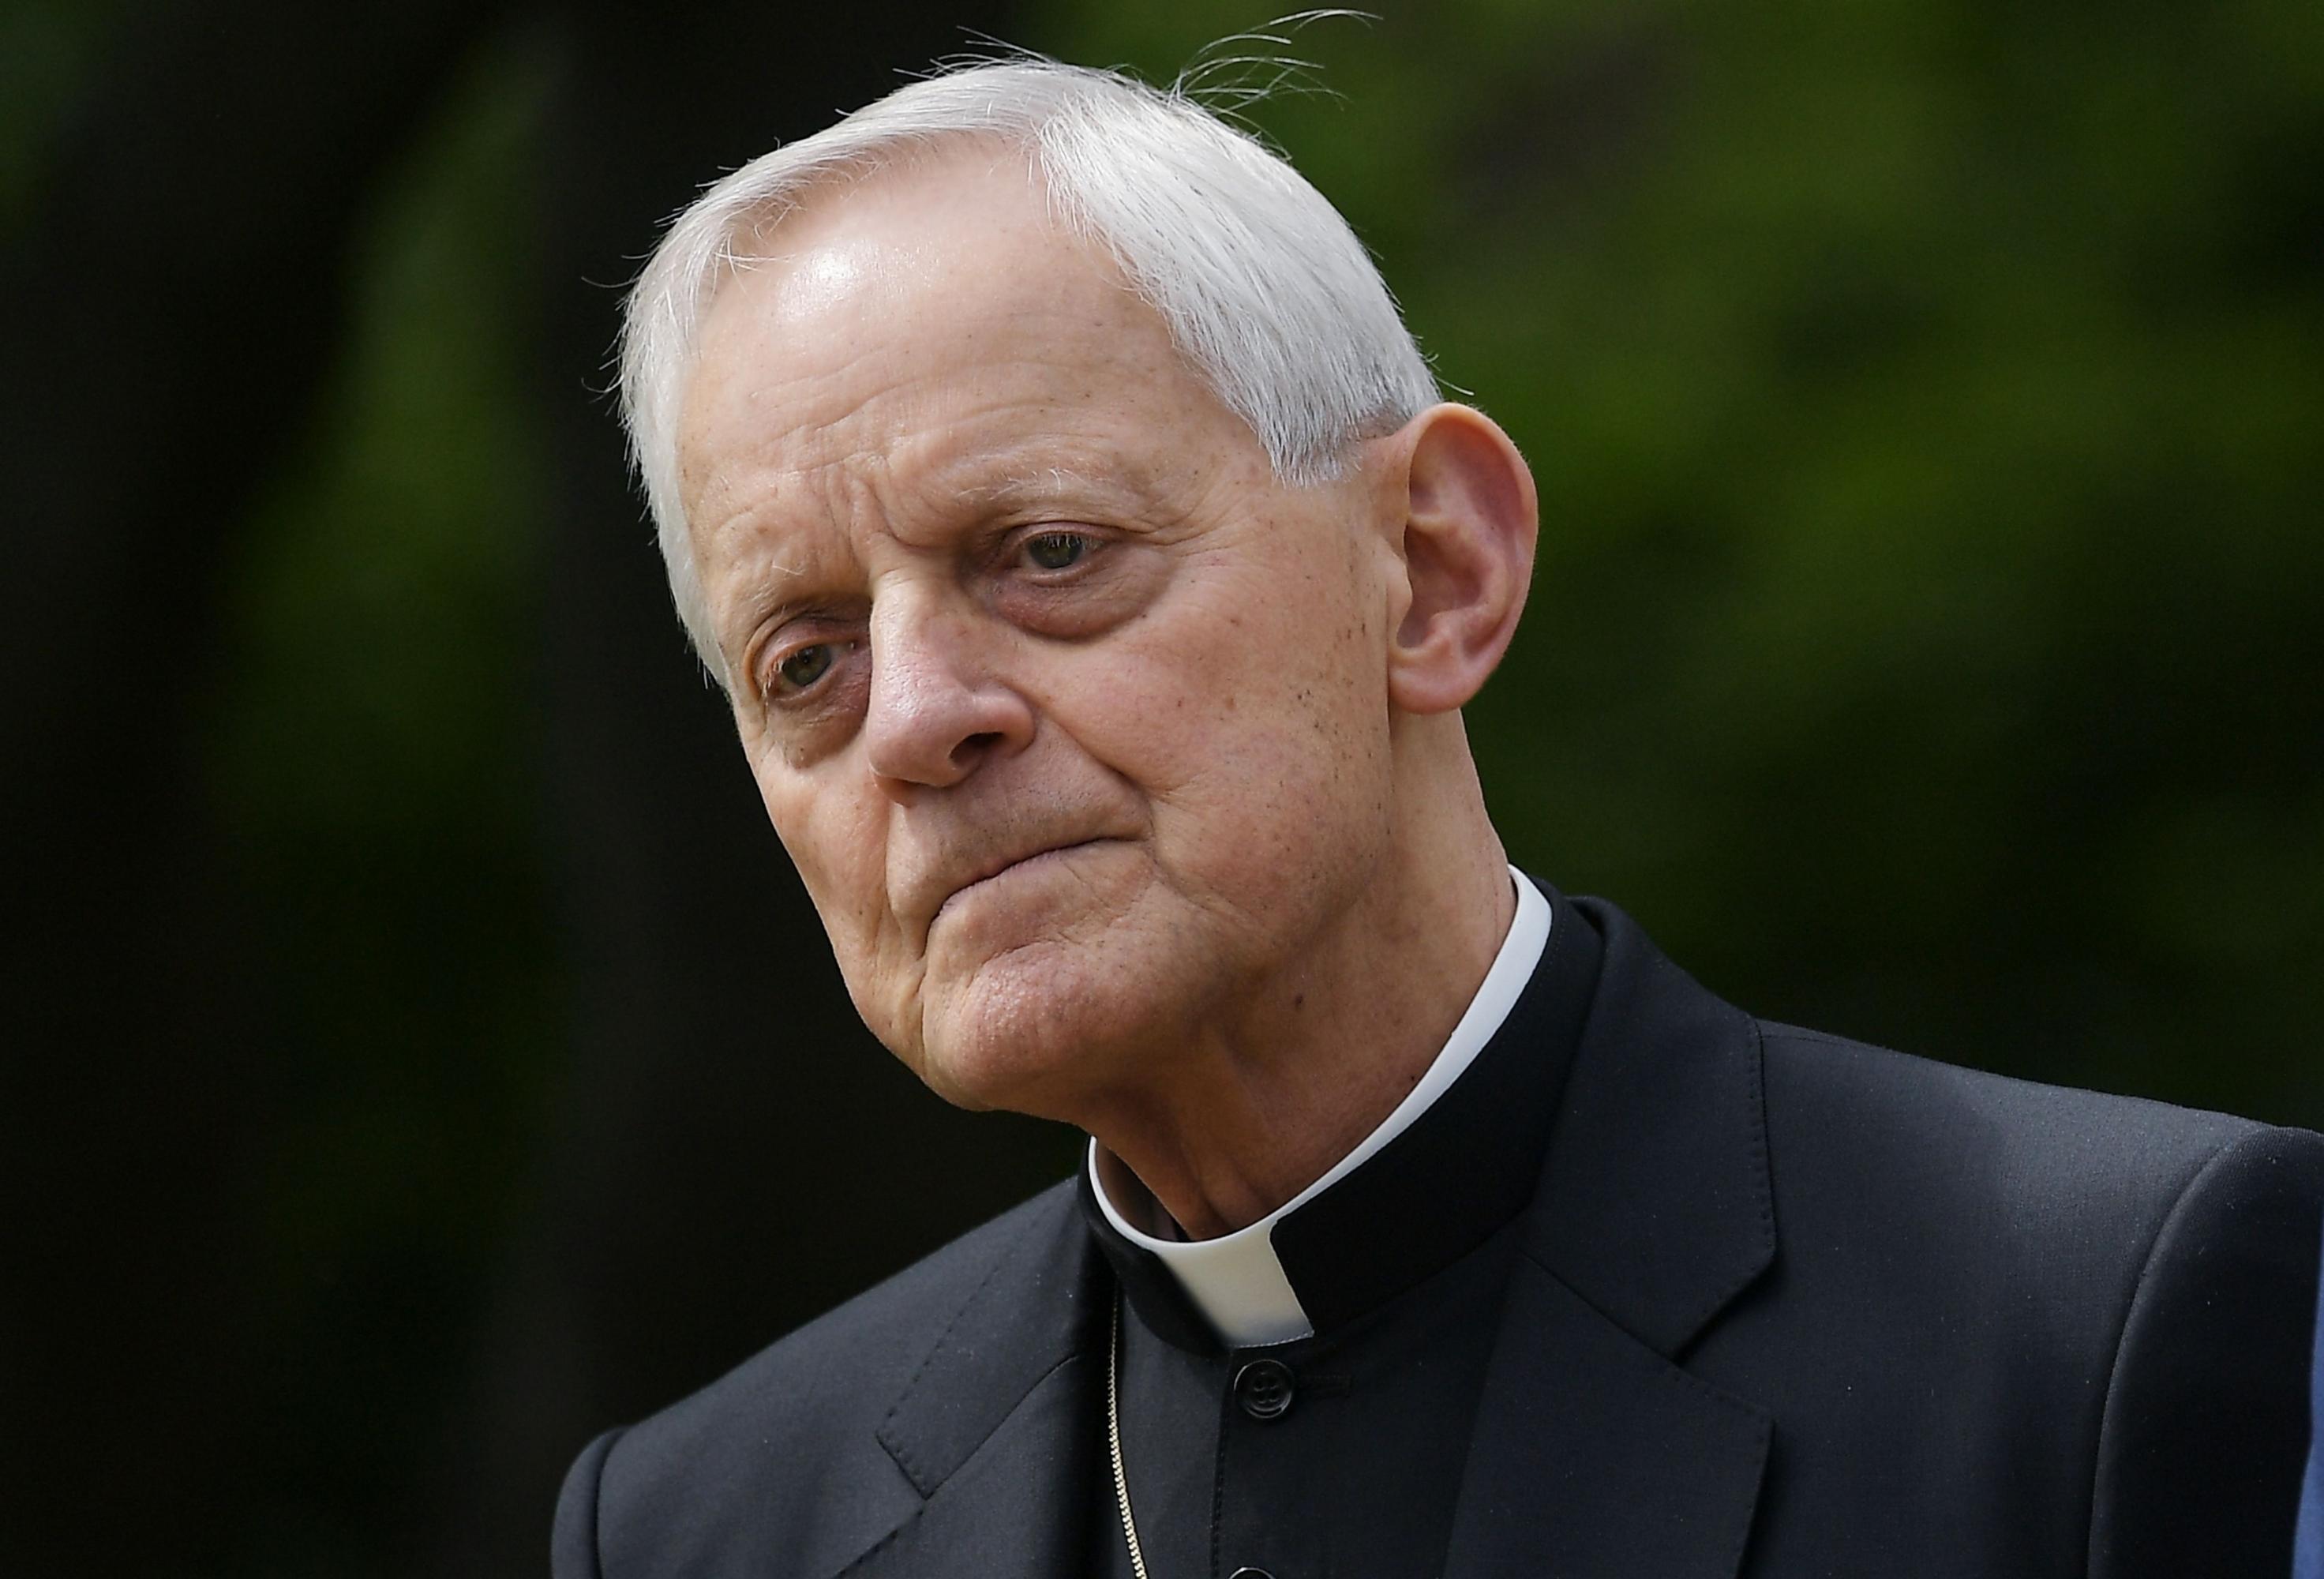 Arzobispo de Washington, Donald Wuerl   Foto: AFP